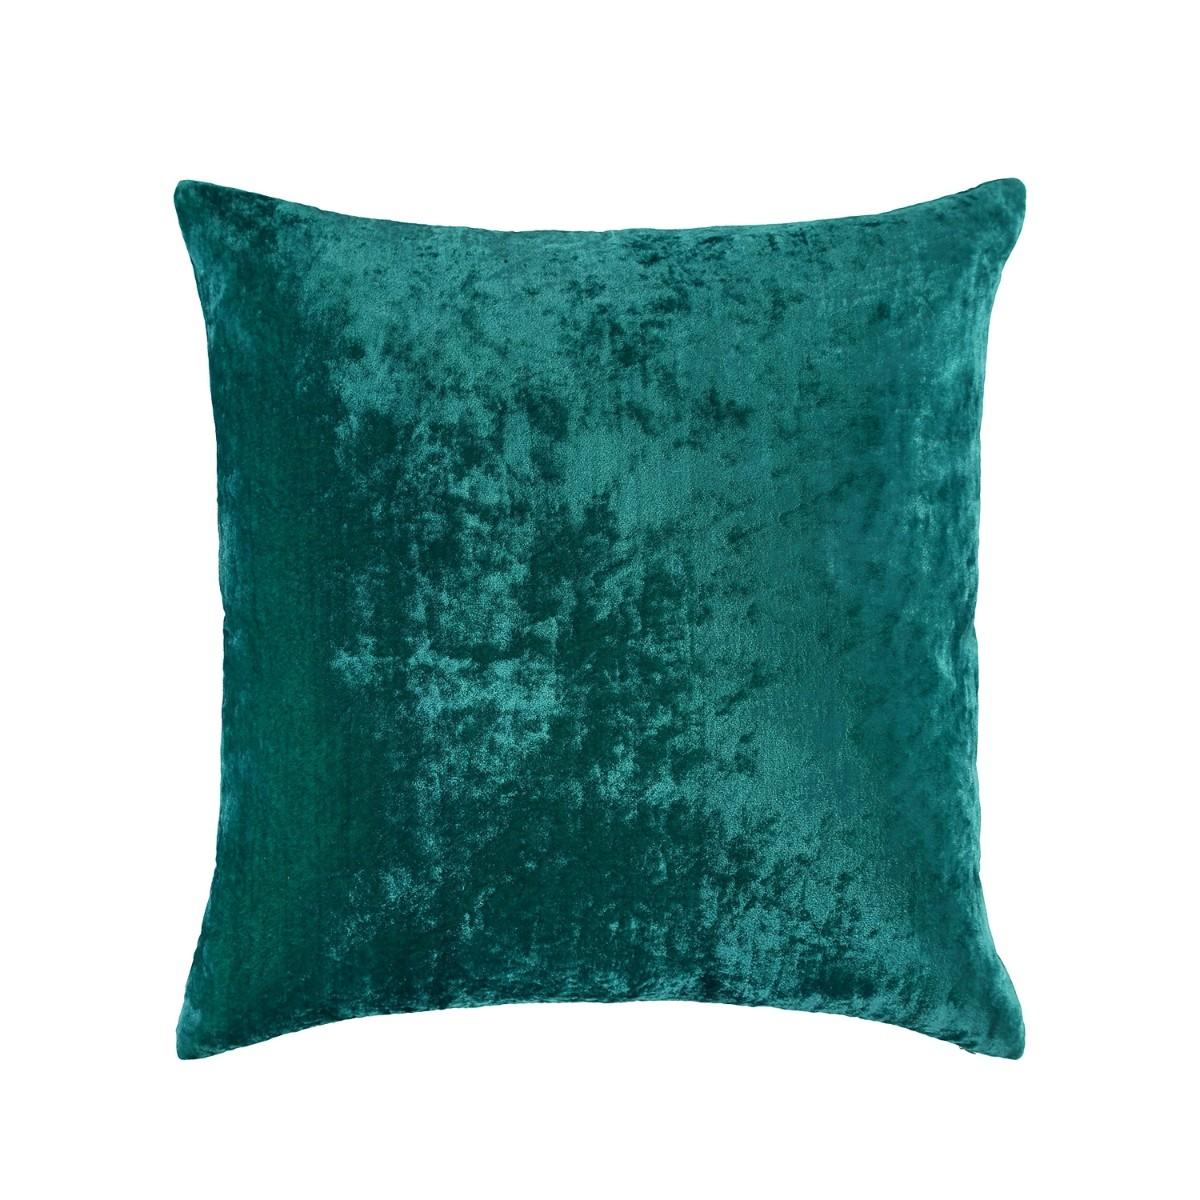 William Yeoward |Paddy Velvet Cushion Jade